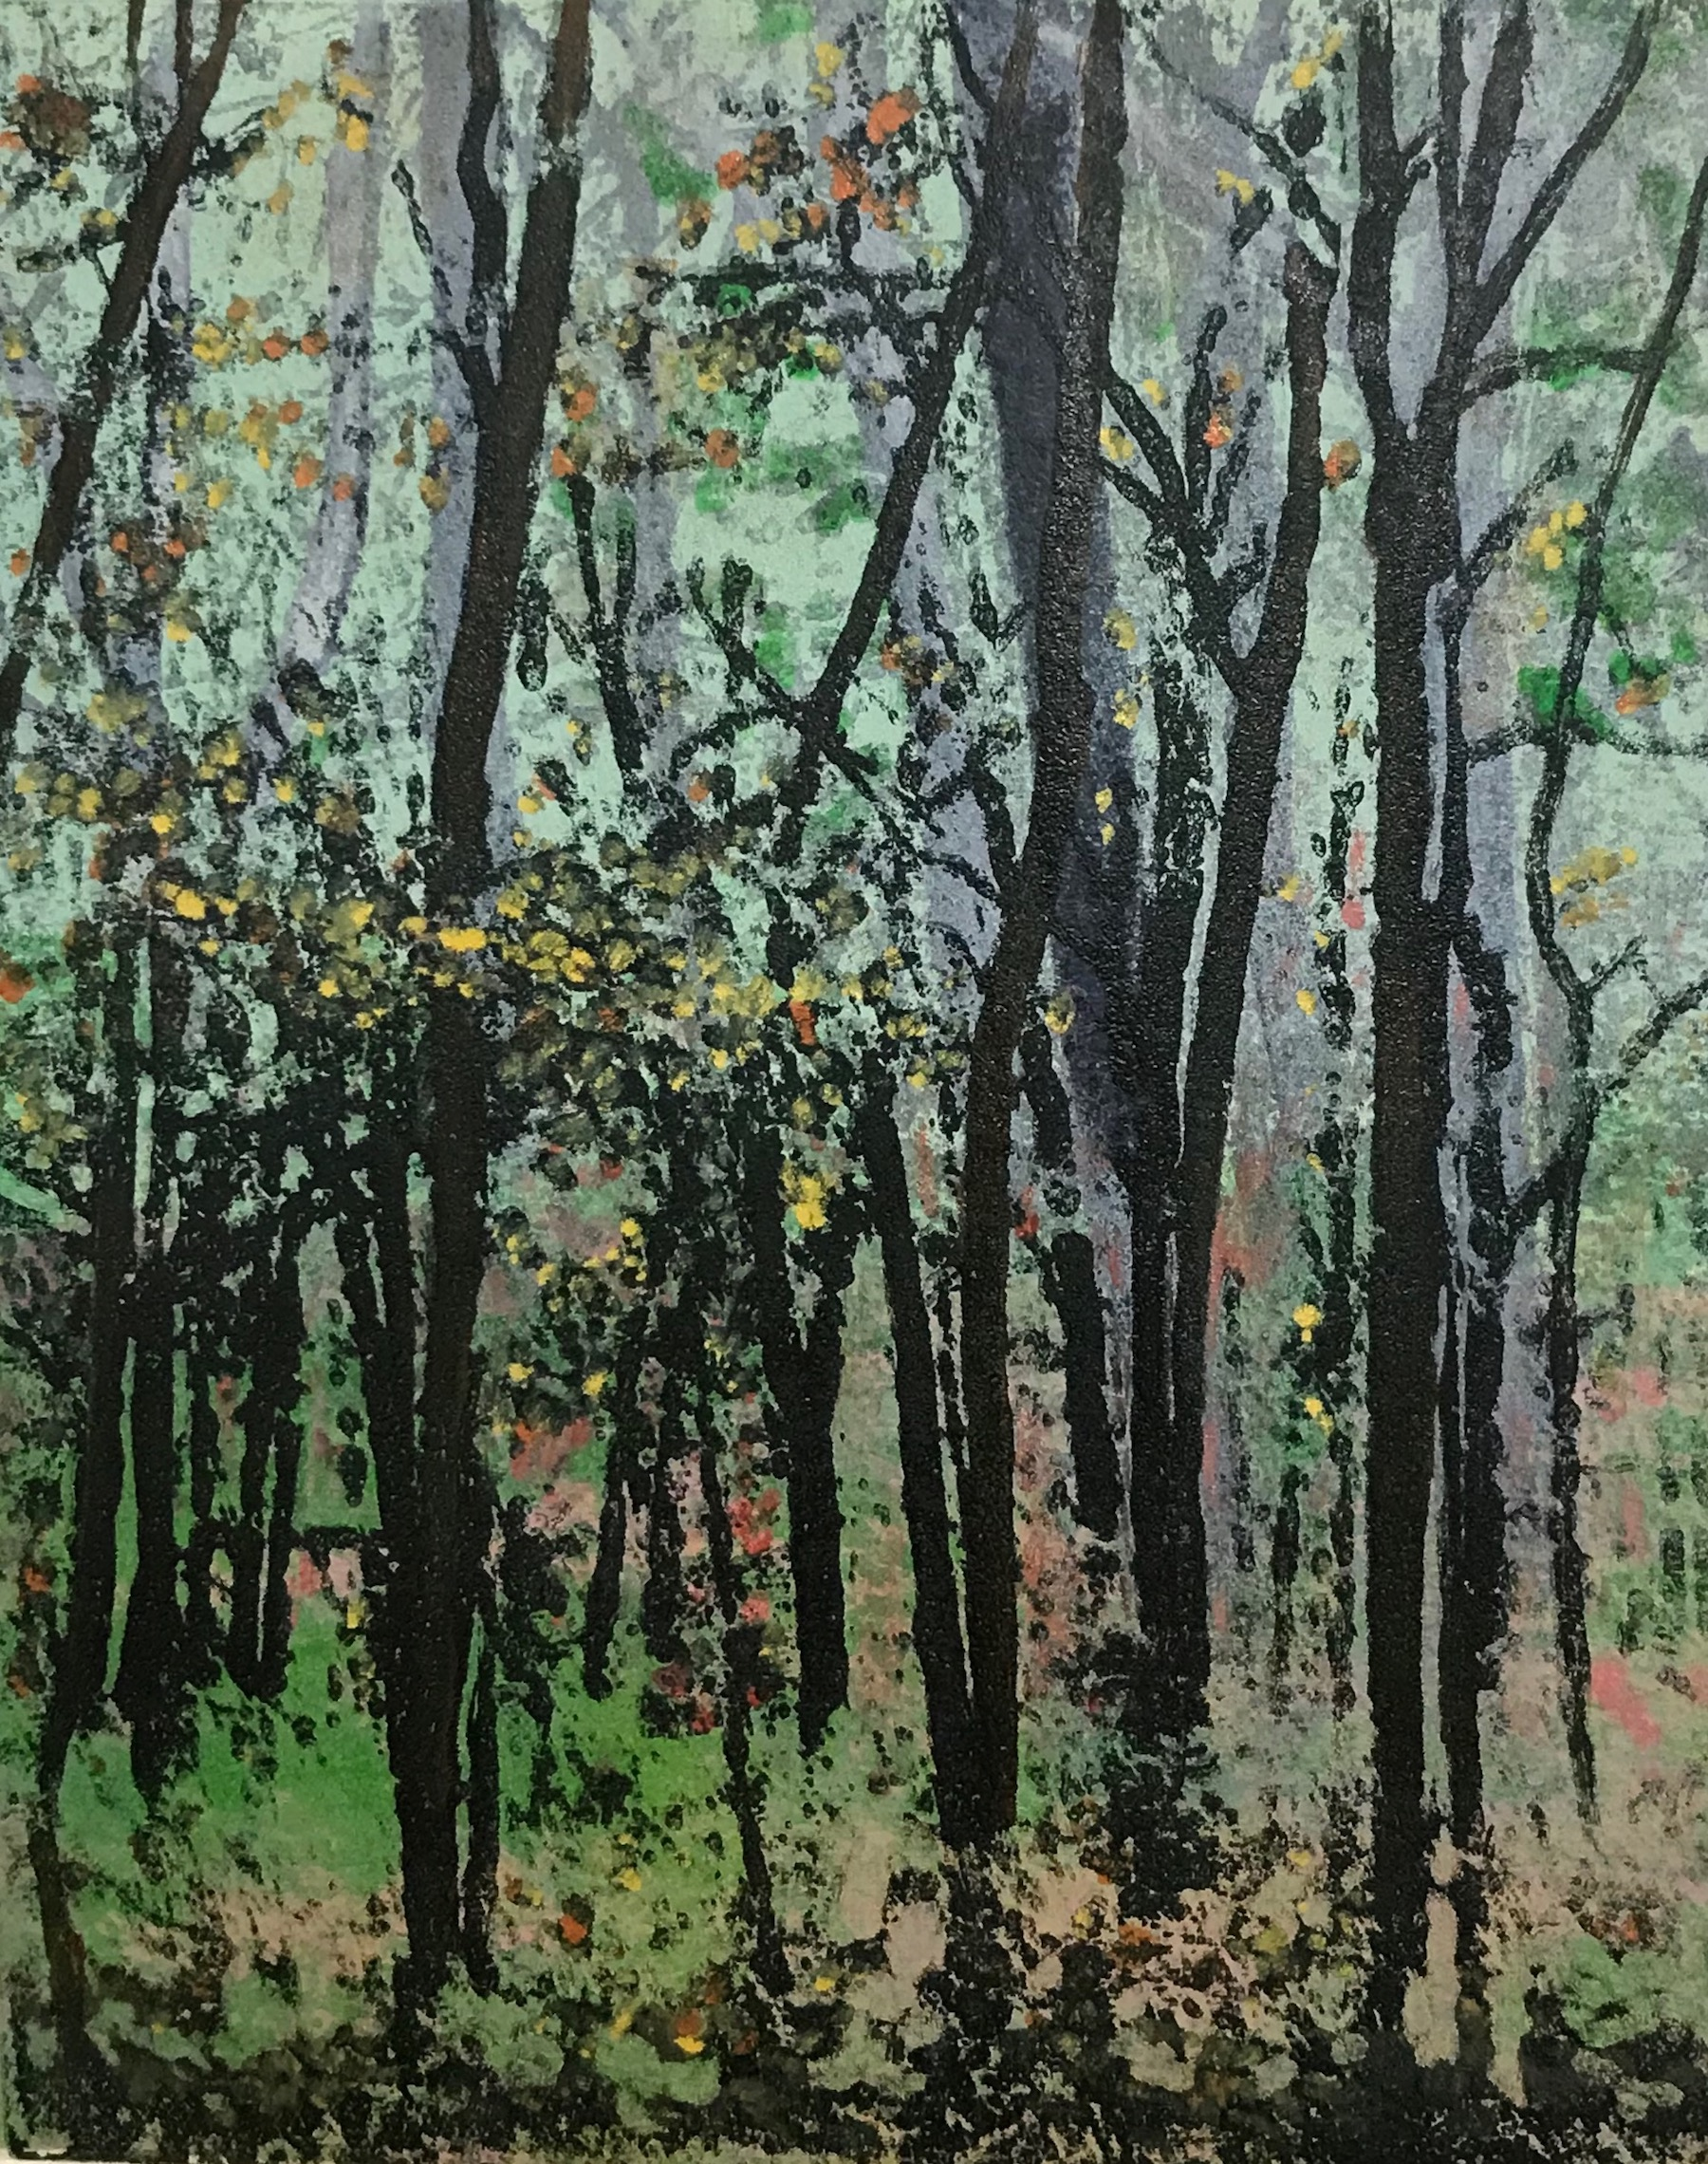 """Wisconsin Woods, Autumn"", monoprint, 10"" x 8"", $150 (unframed)"